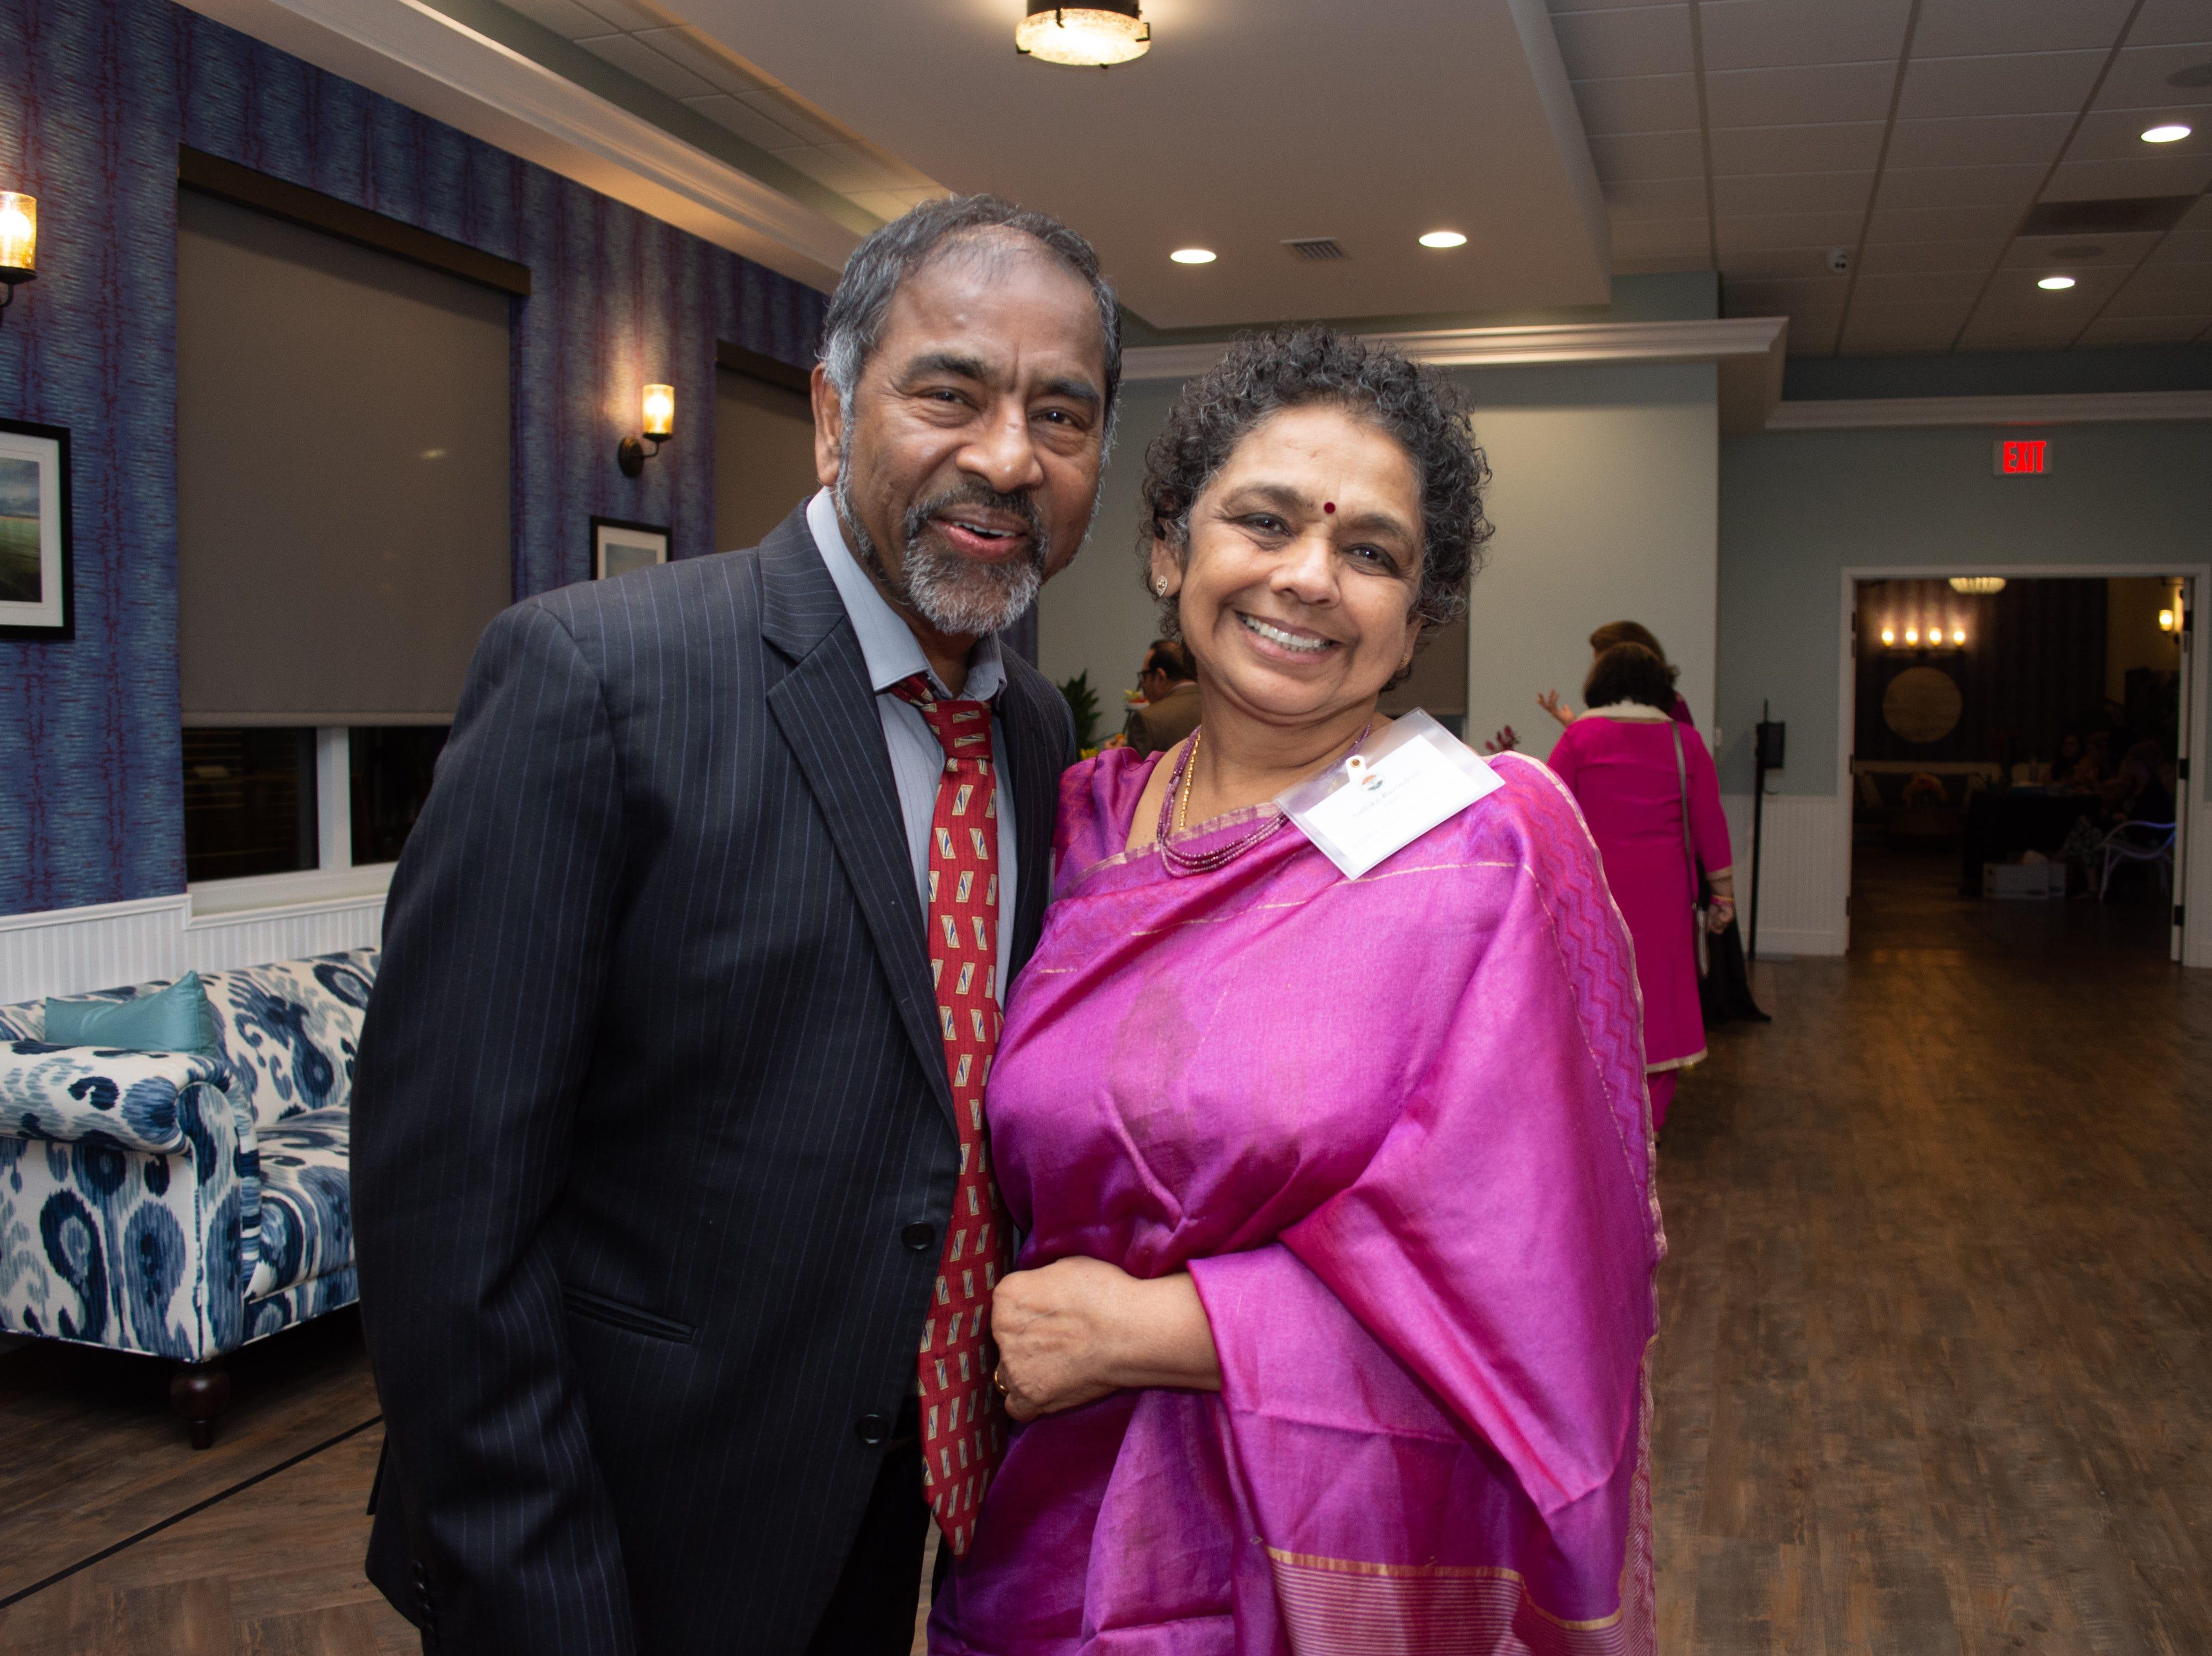 Dr. Ravi Palaniyandi and his wife Ambika Palaniyandi.